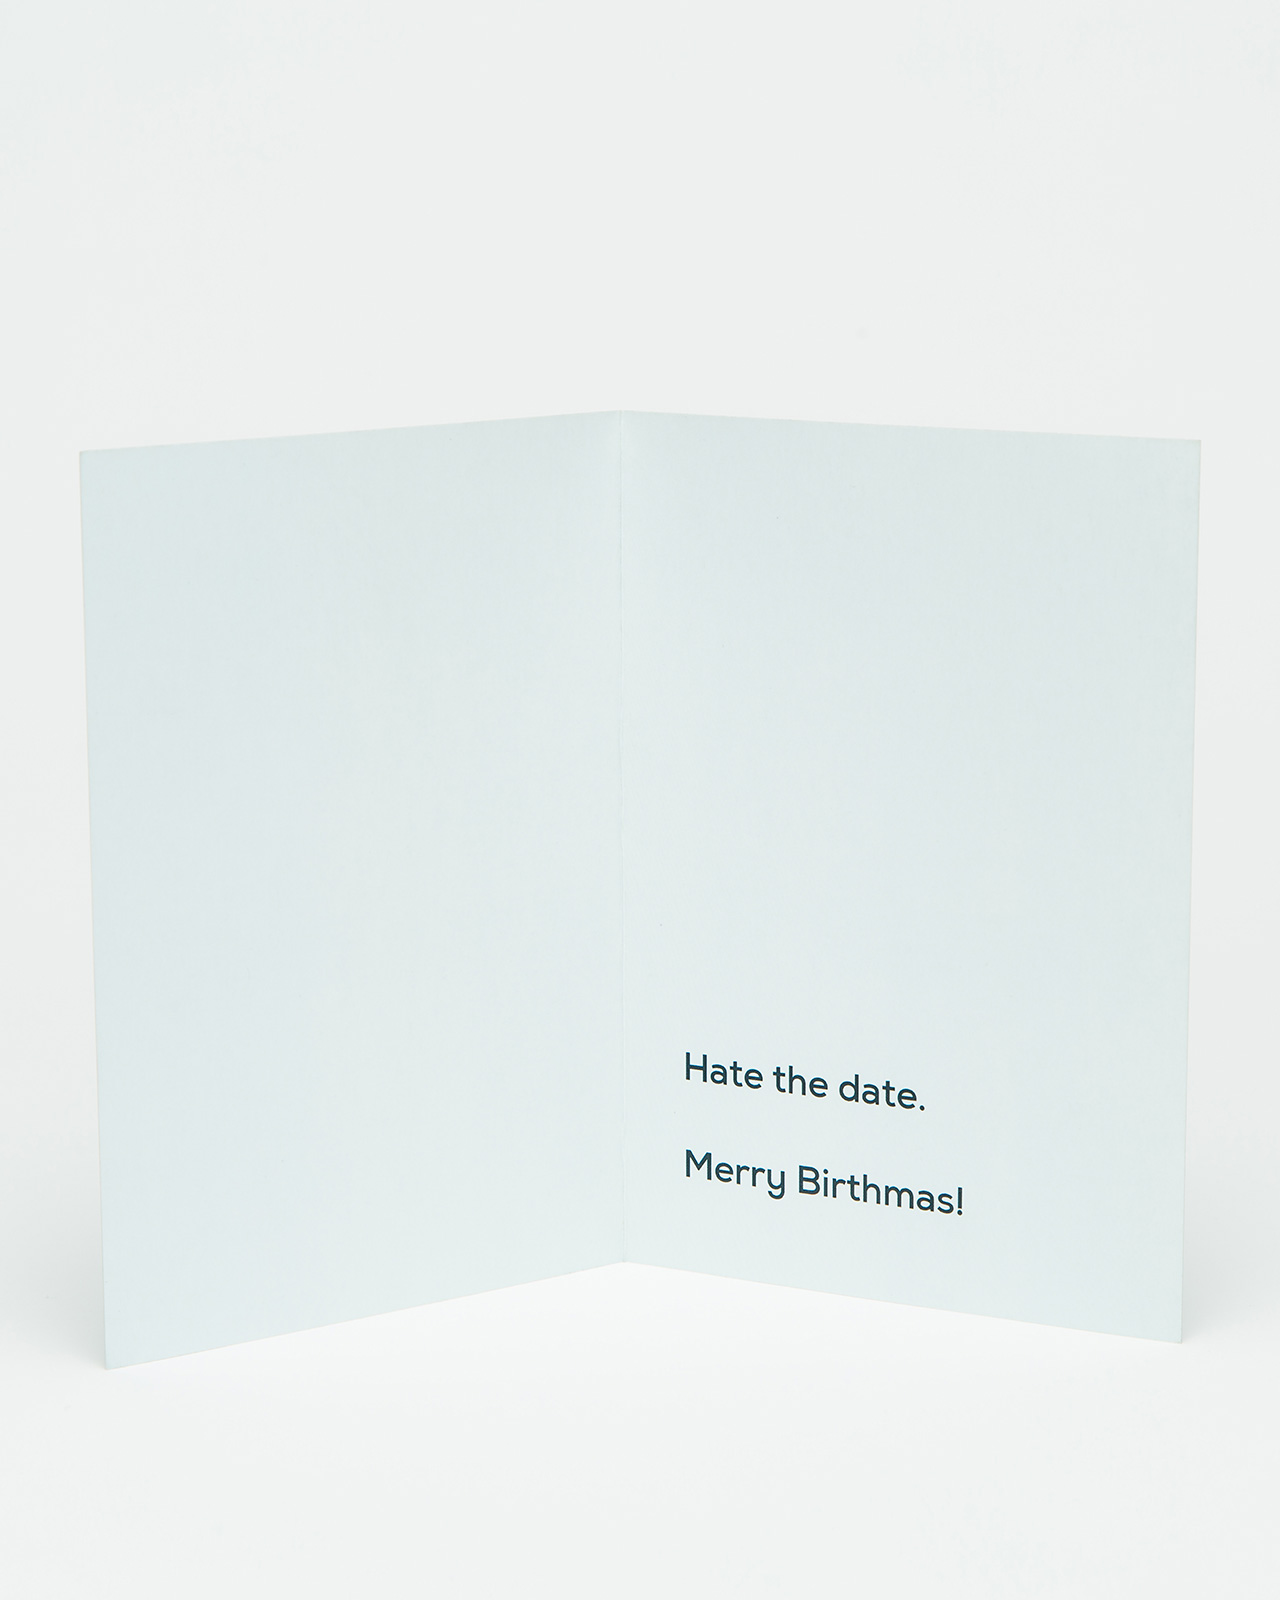 merry-birthmas-4